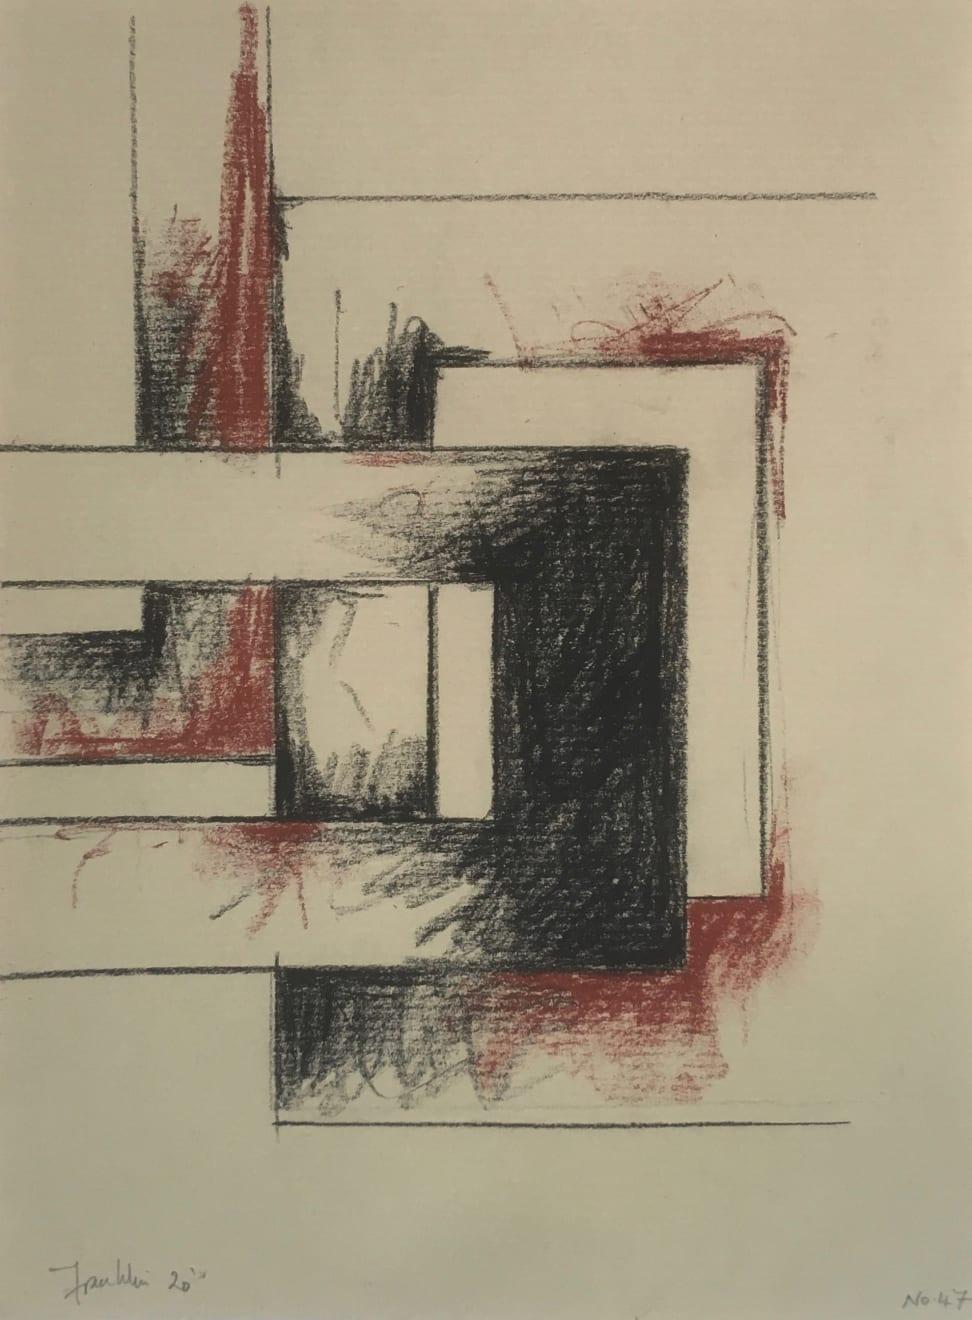 Malcolm Franklin, Tenement Sketch no.47, 2020